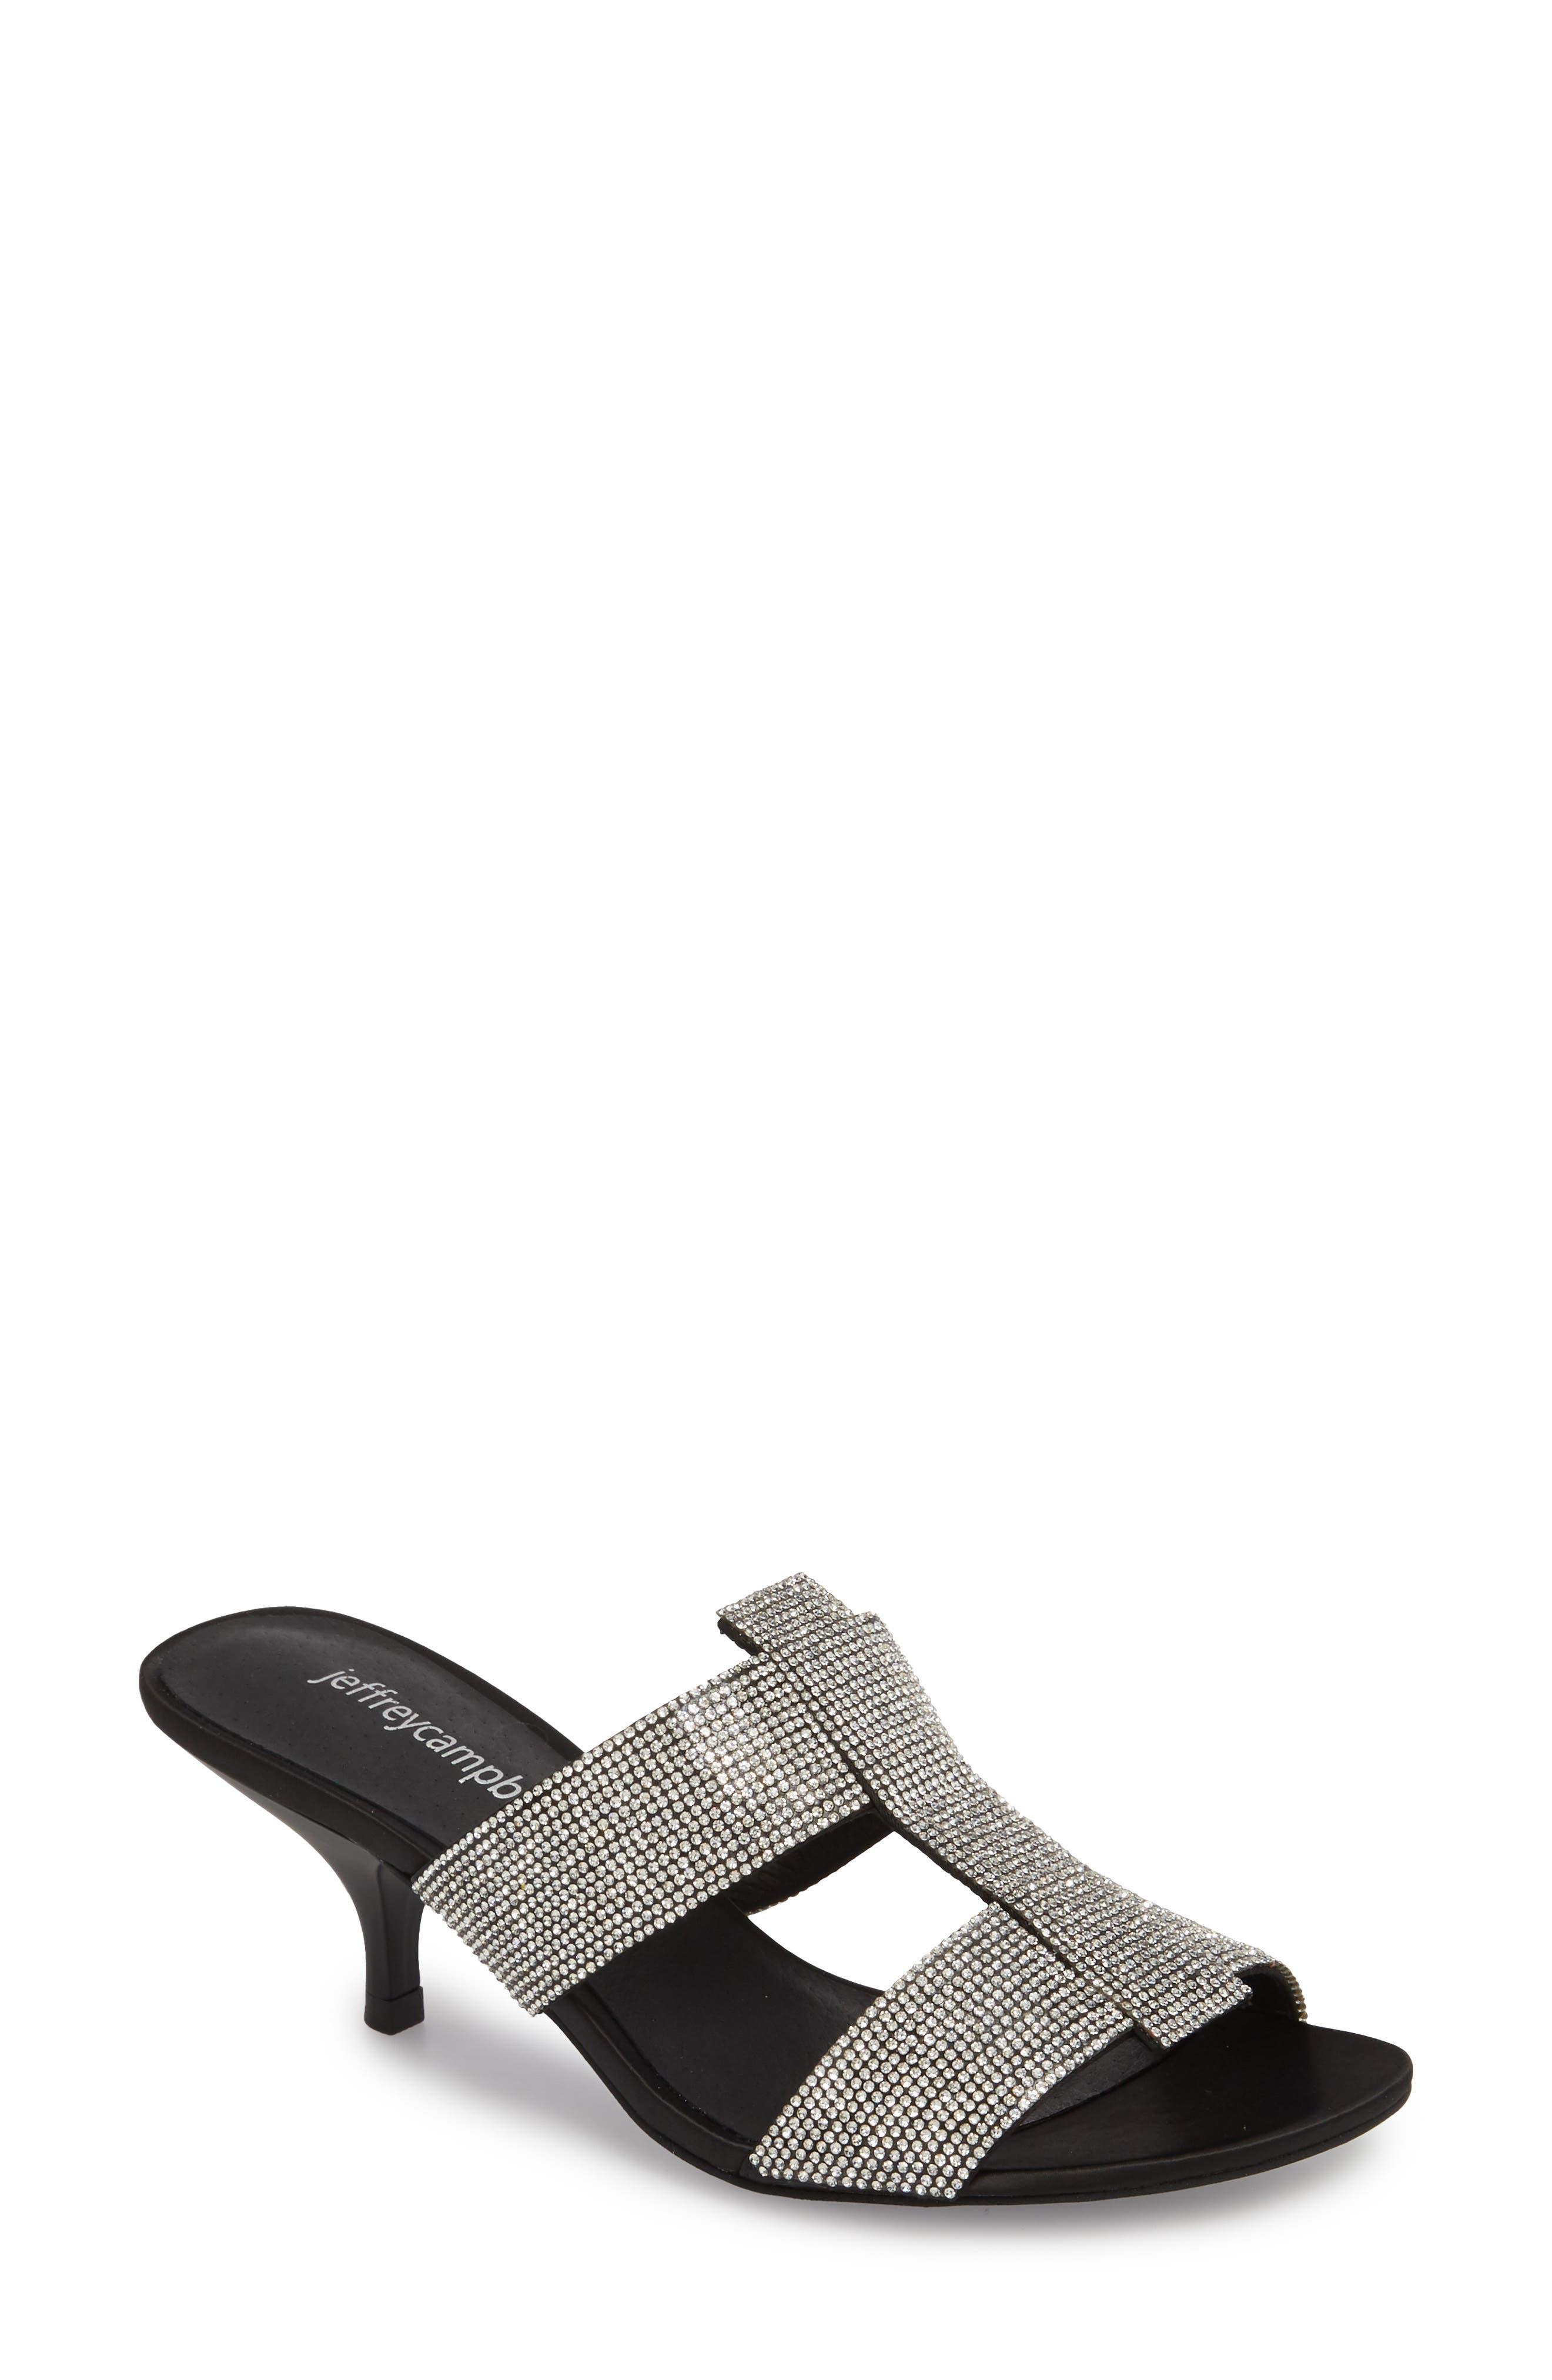 Tartine Embellished Slide Sandal,                             Main thumbnail 1, color,                             Black Satin/ Silver